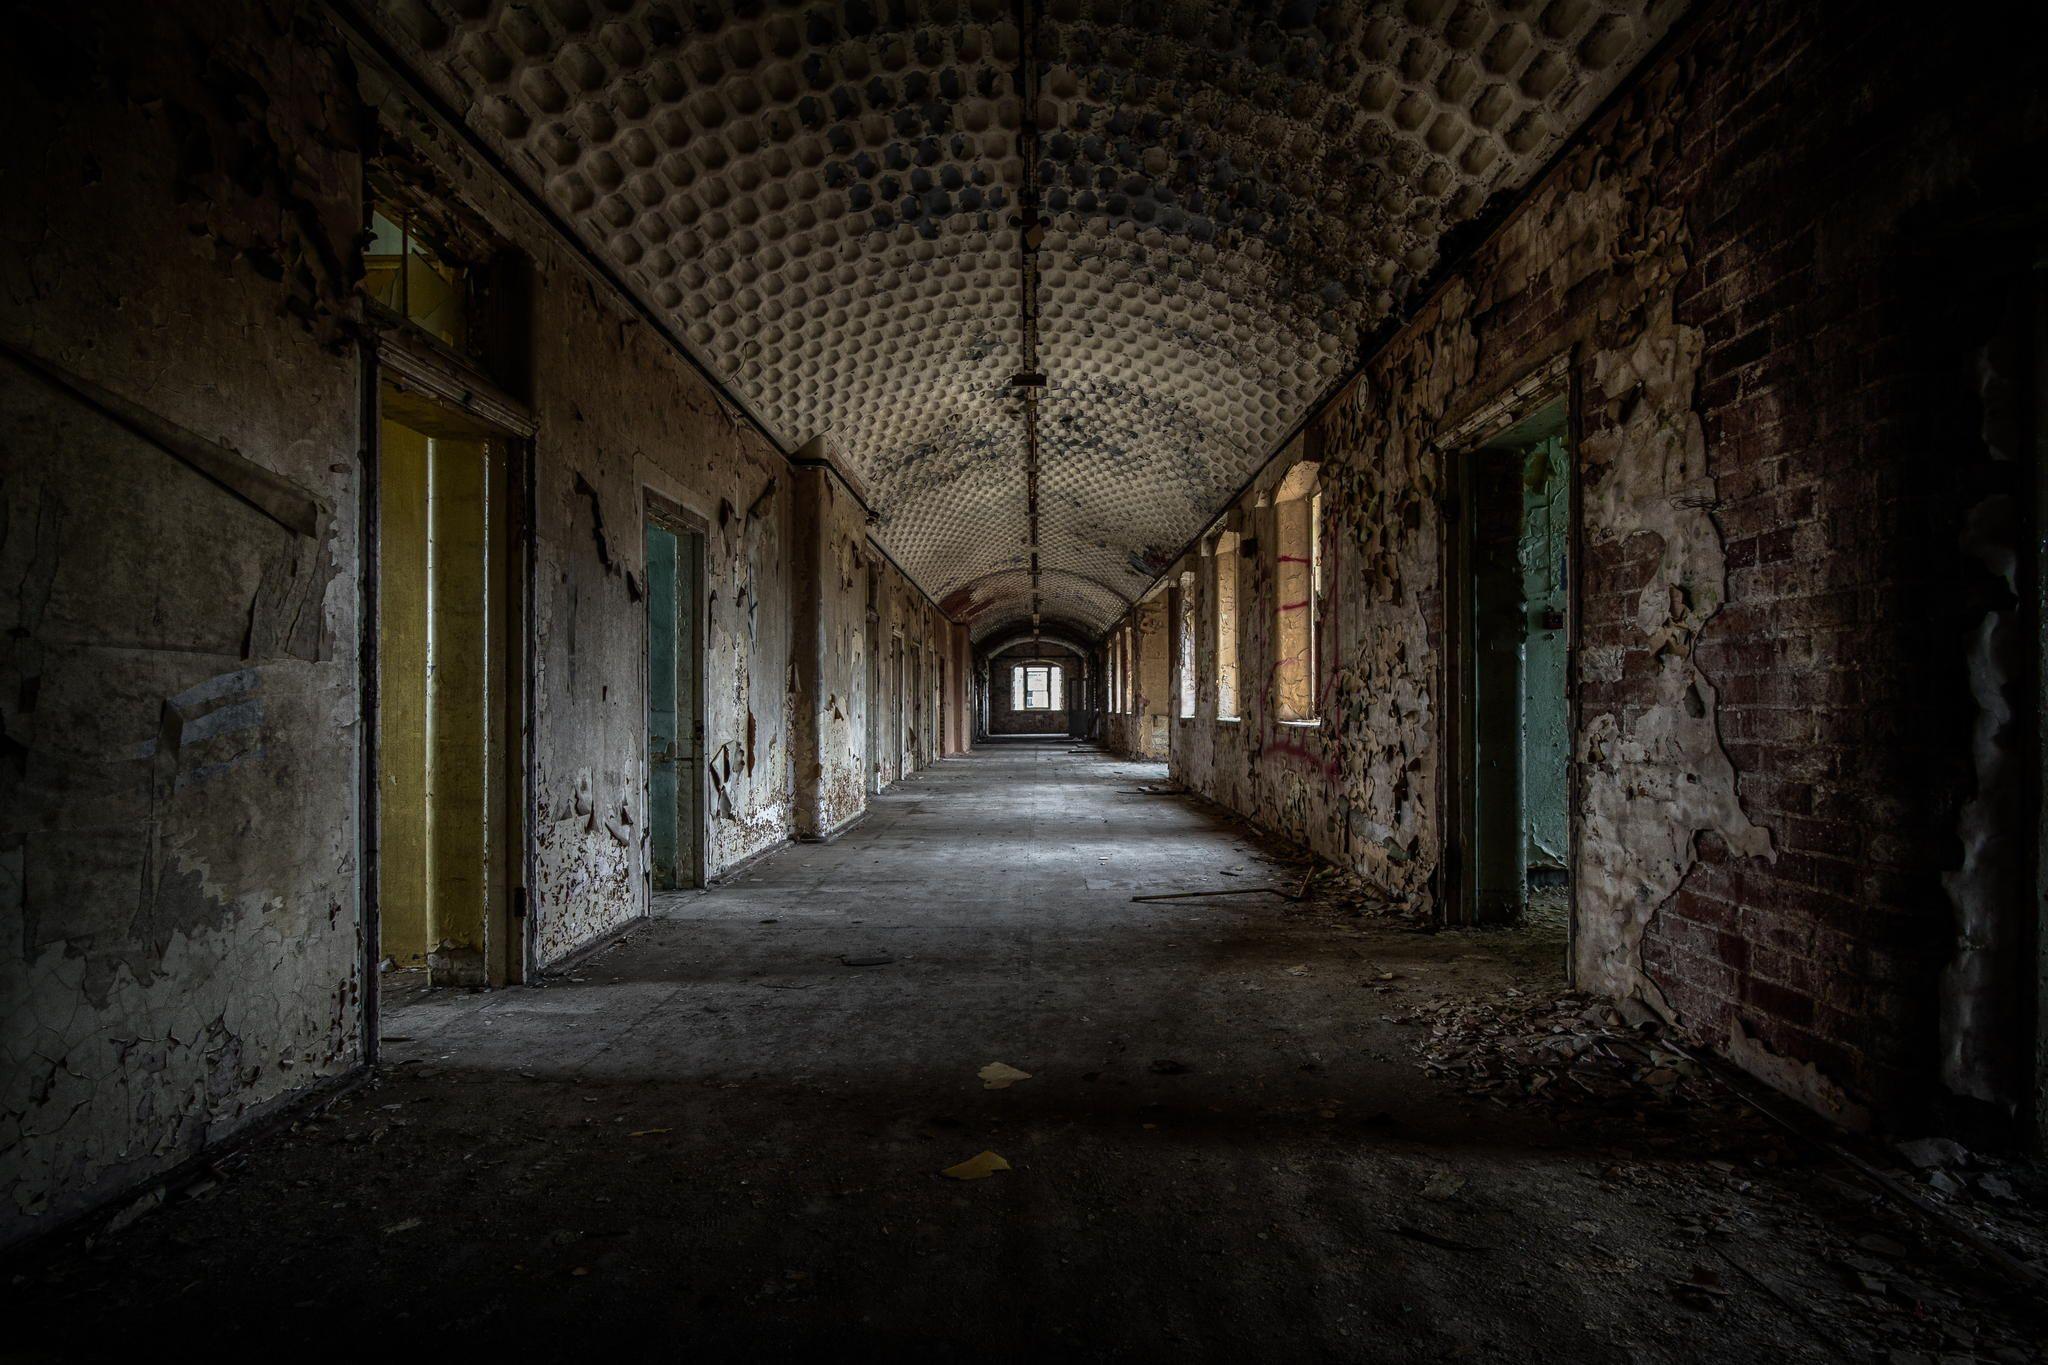 St Johns Asylum aka The Lincolnshire County Pauper Lunatic Asylu by PROJ3CT M4YH3M on 500px